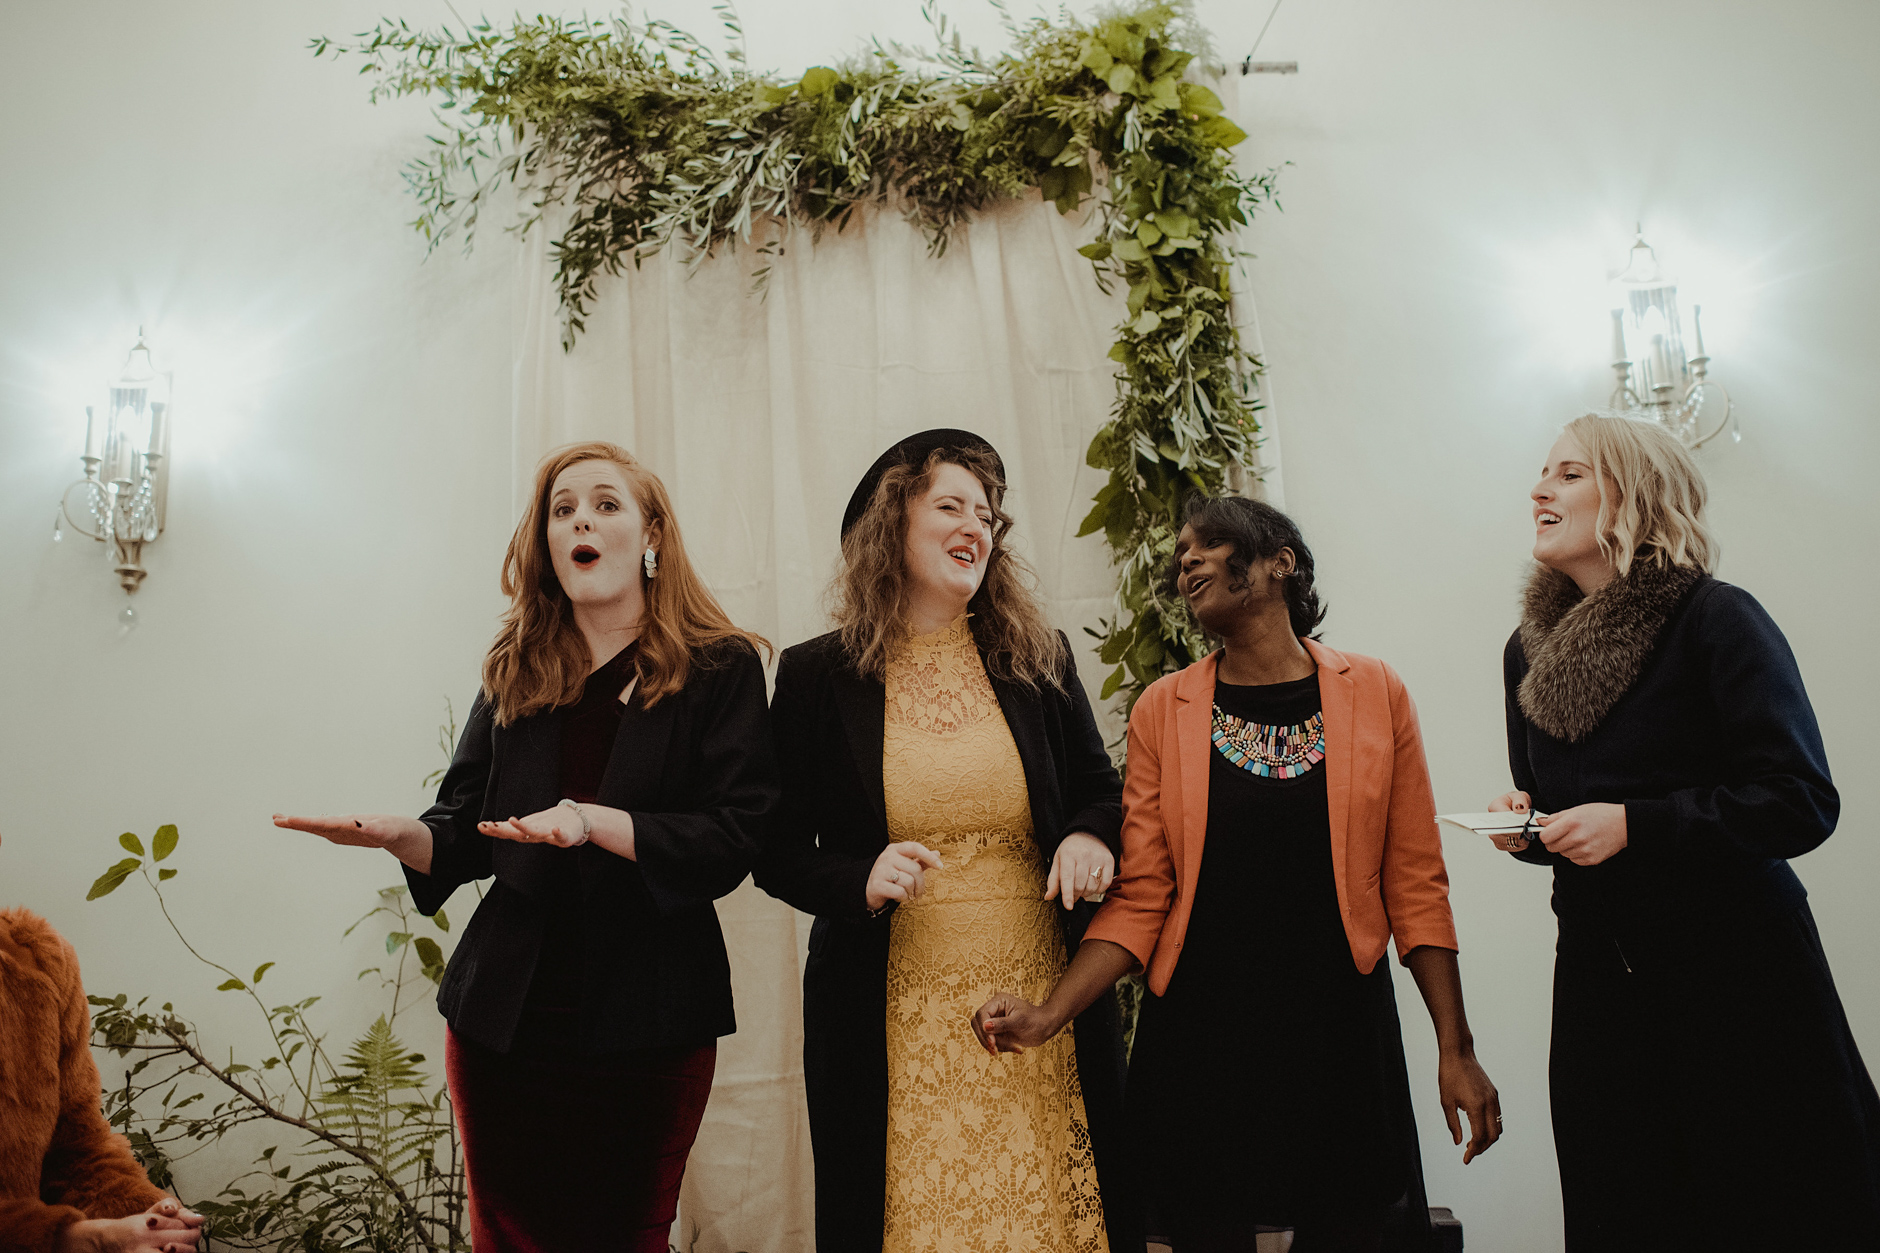 Glentruim-Wedding-Nikki-Leadbetter-Photography-98.jpg